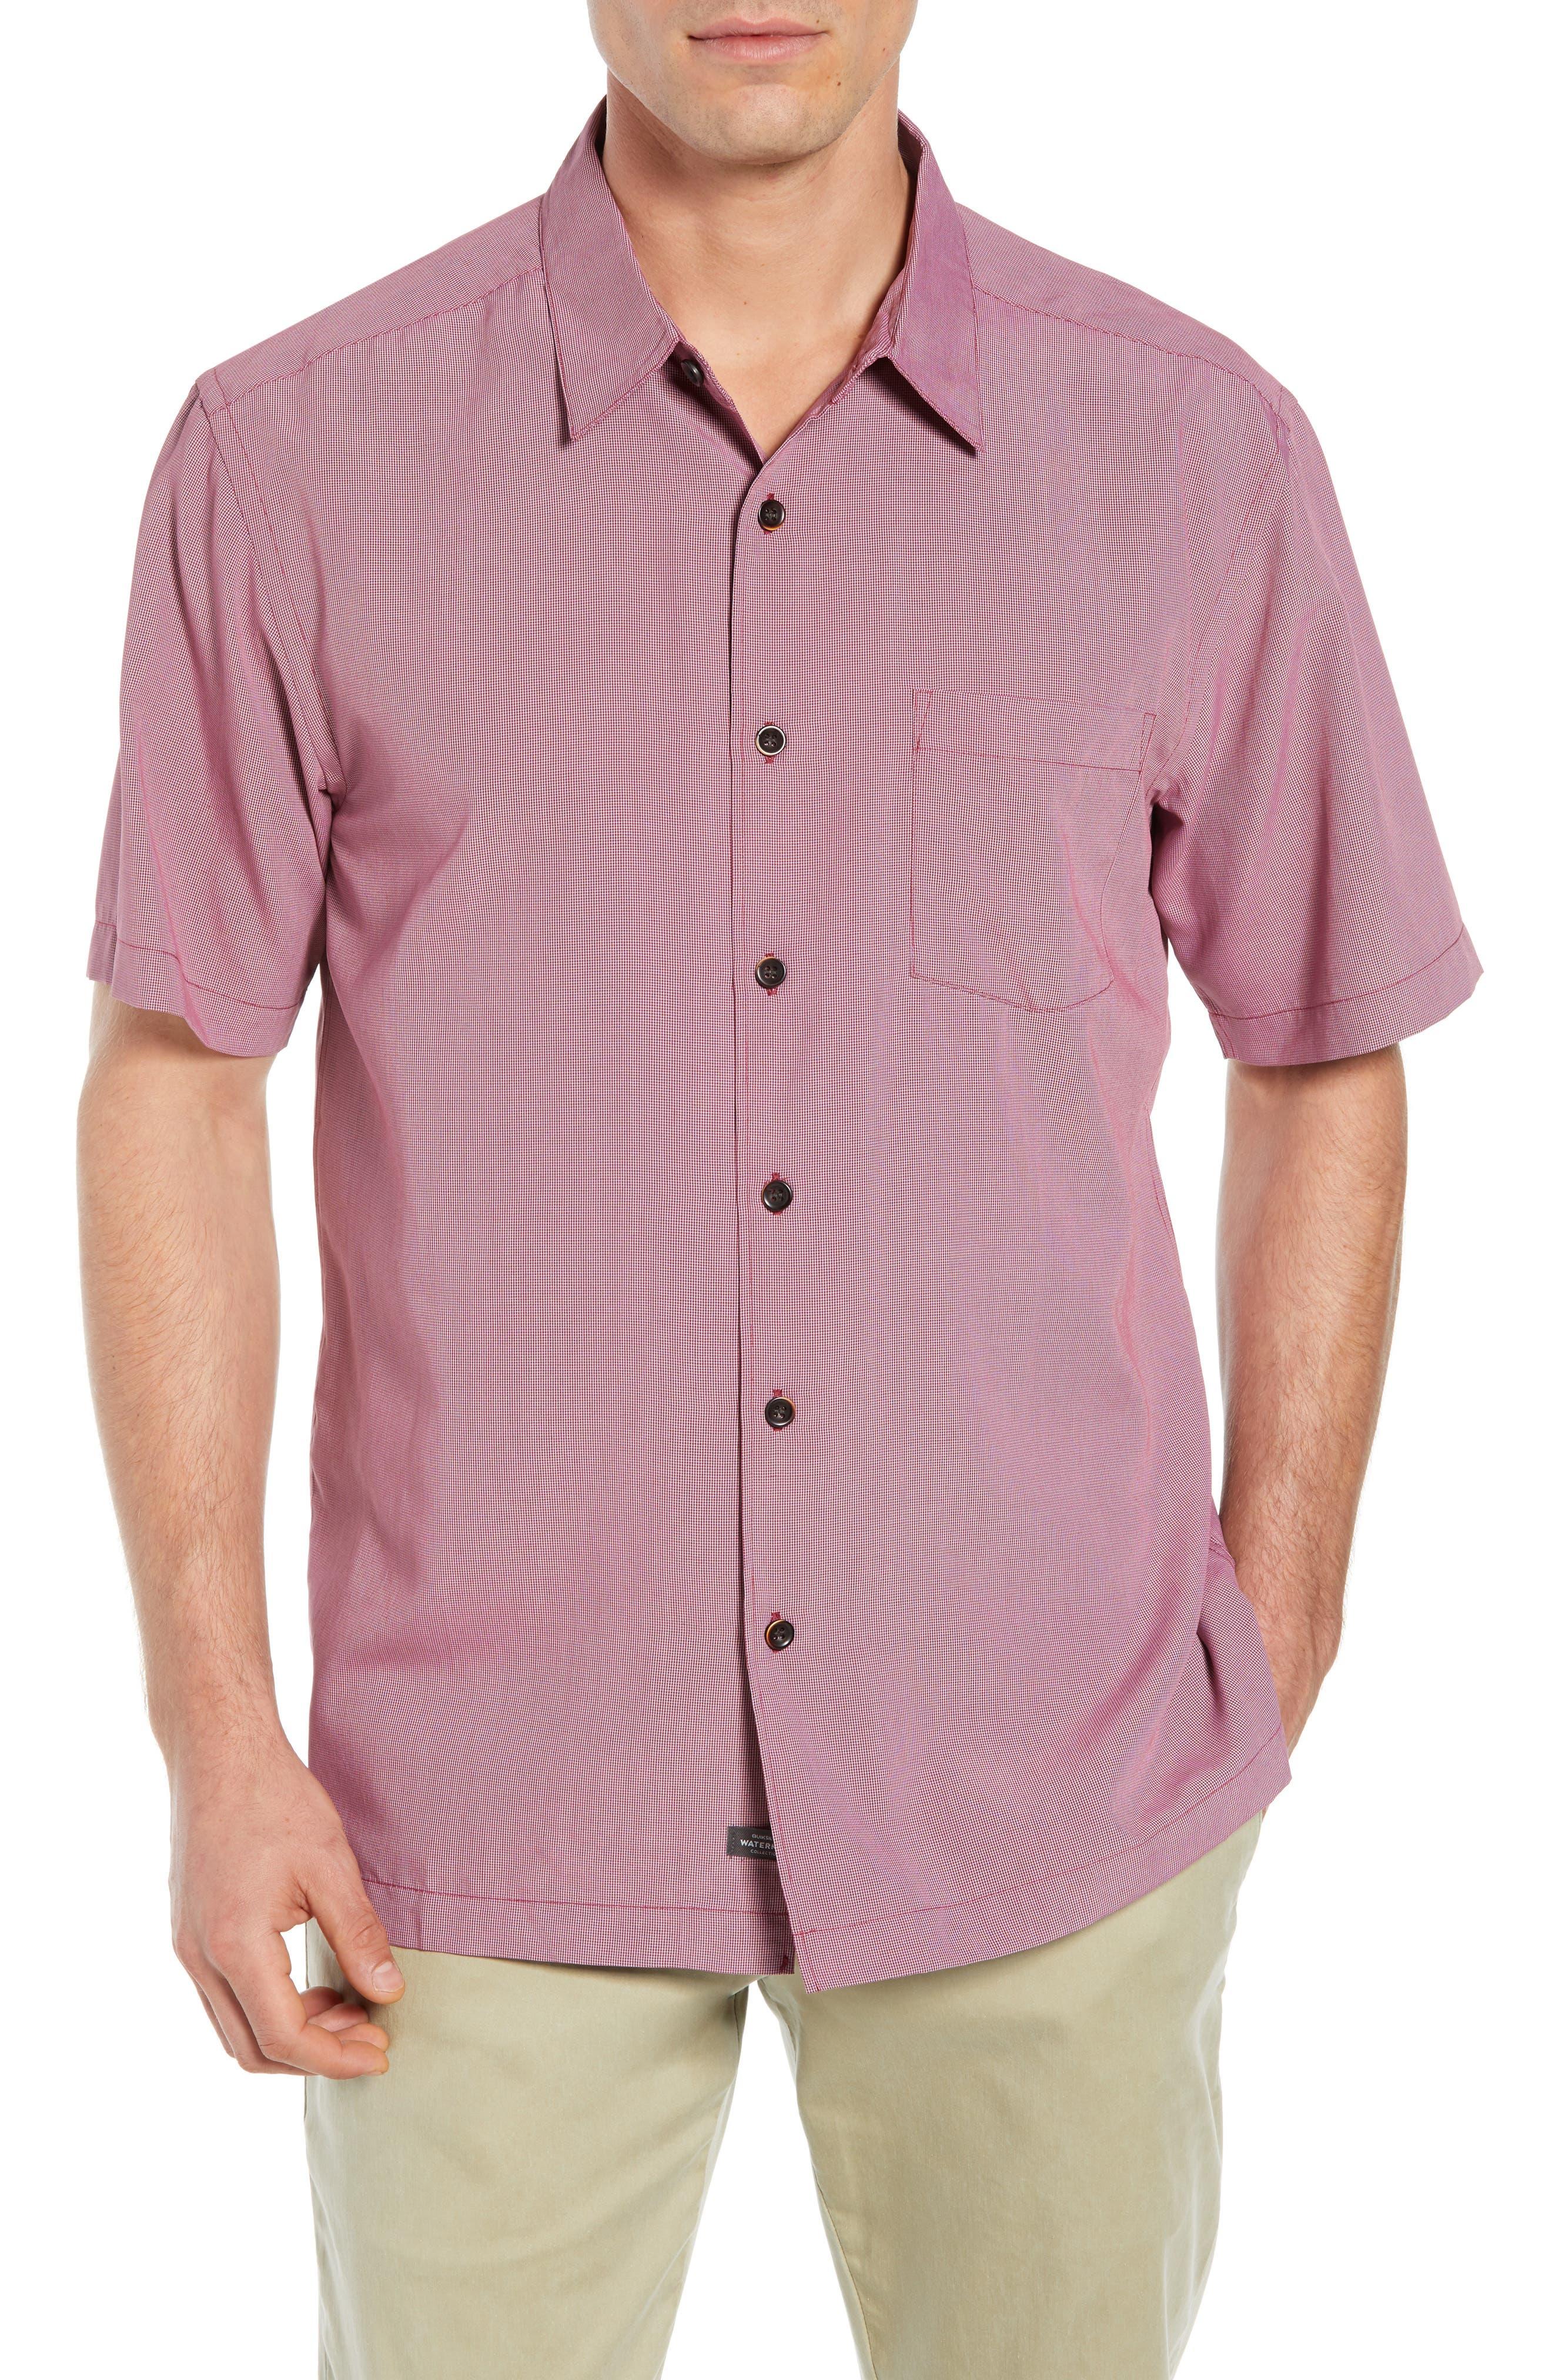 Cane Island Classic Fit Camp Shirt,                             Main thumbnail 1, color,                             TAWNY PORT